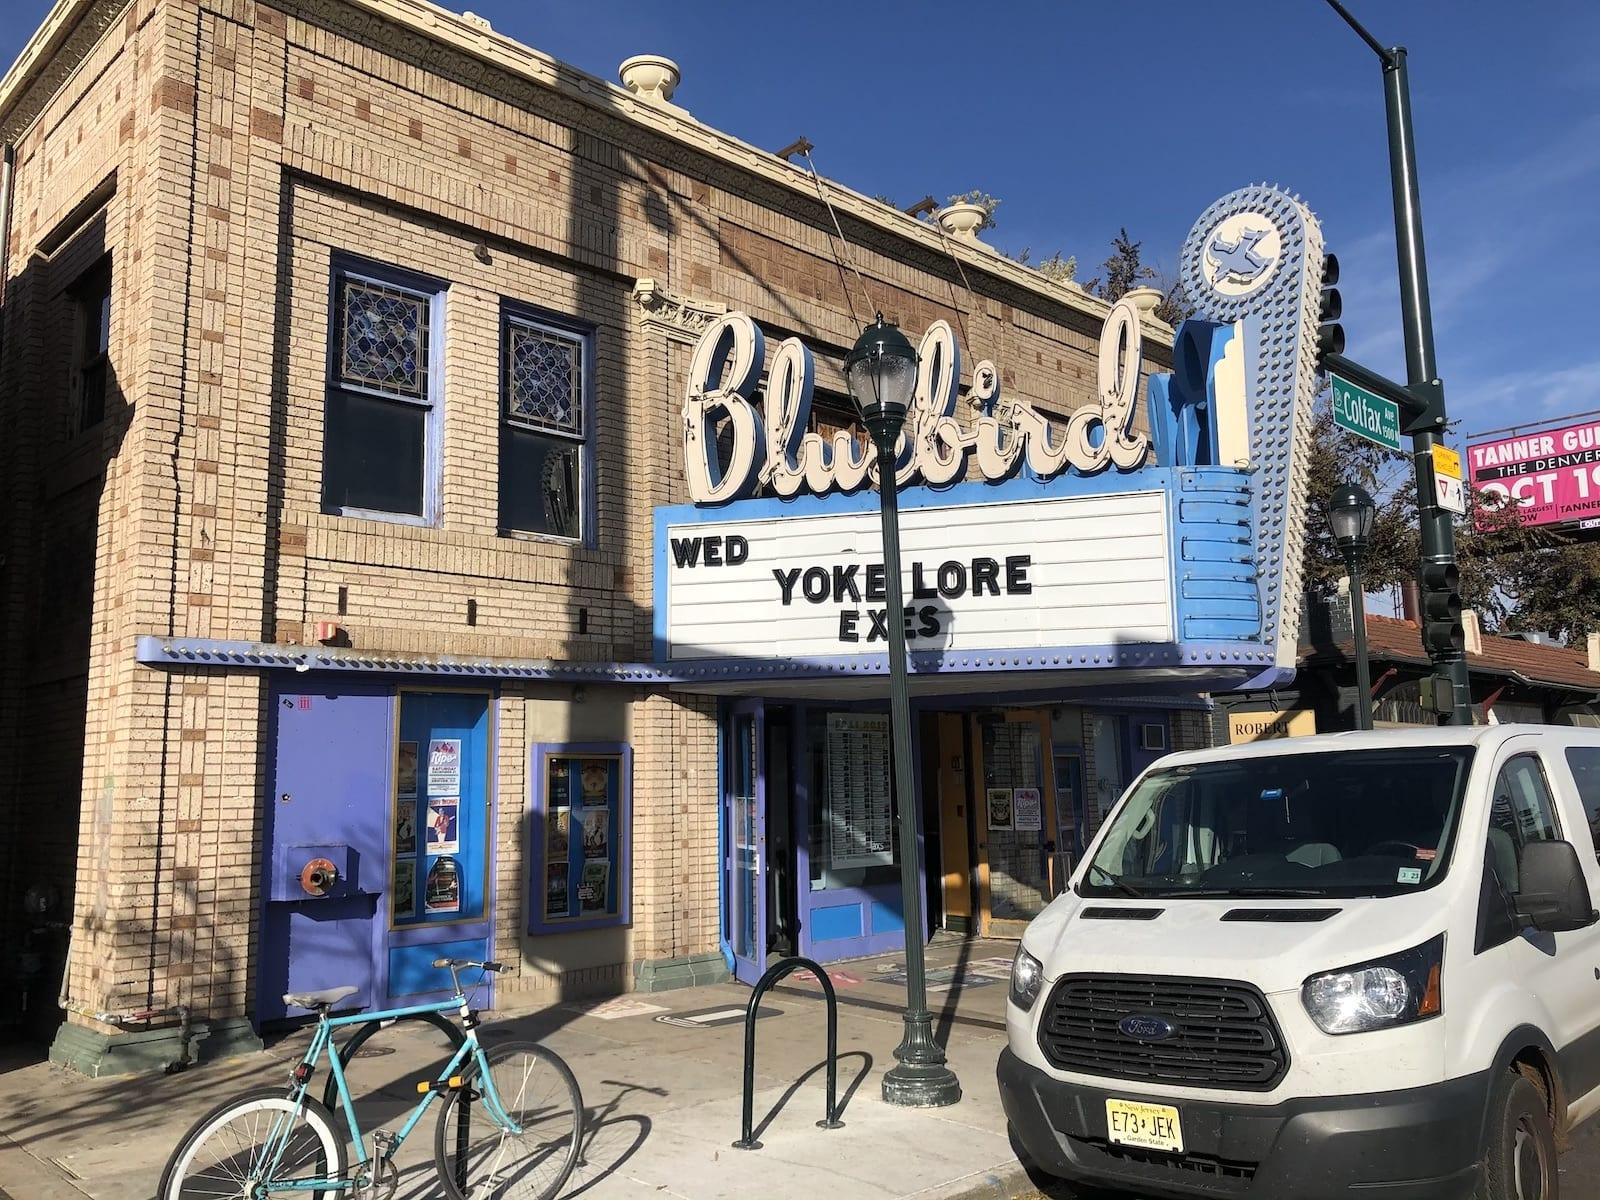 East Colfax Avenue Bluebird Theater